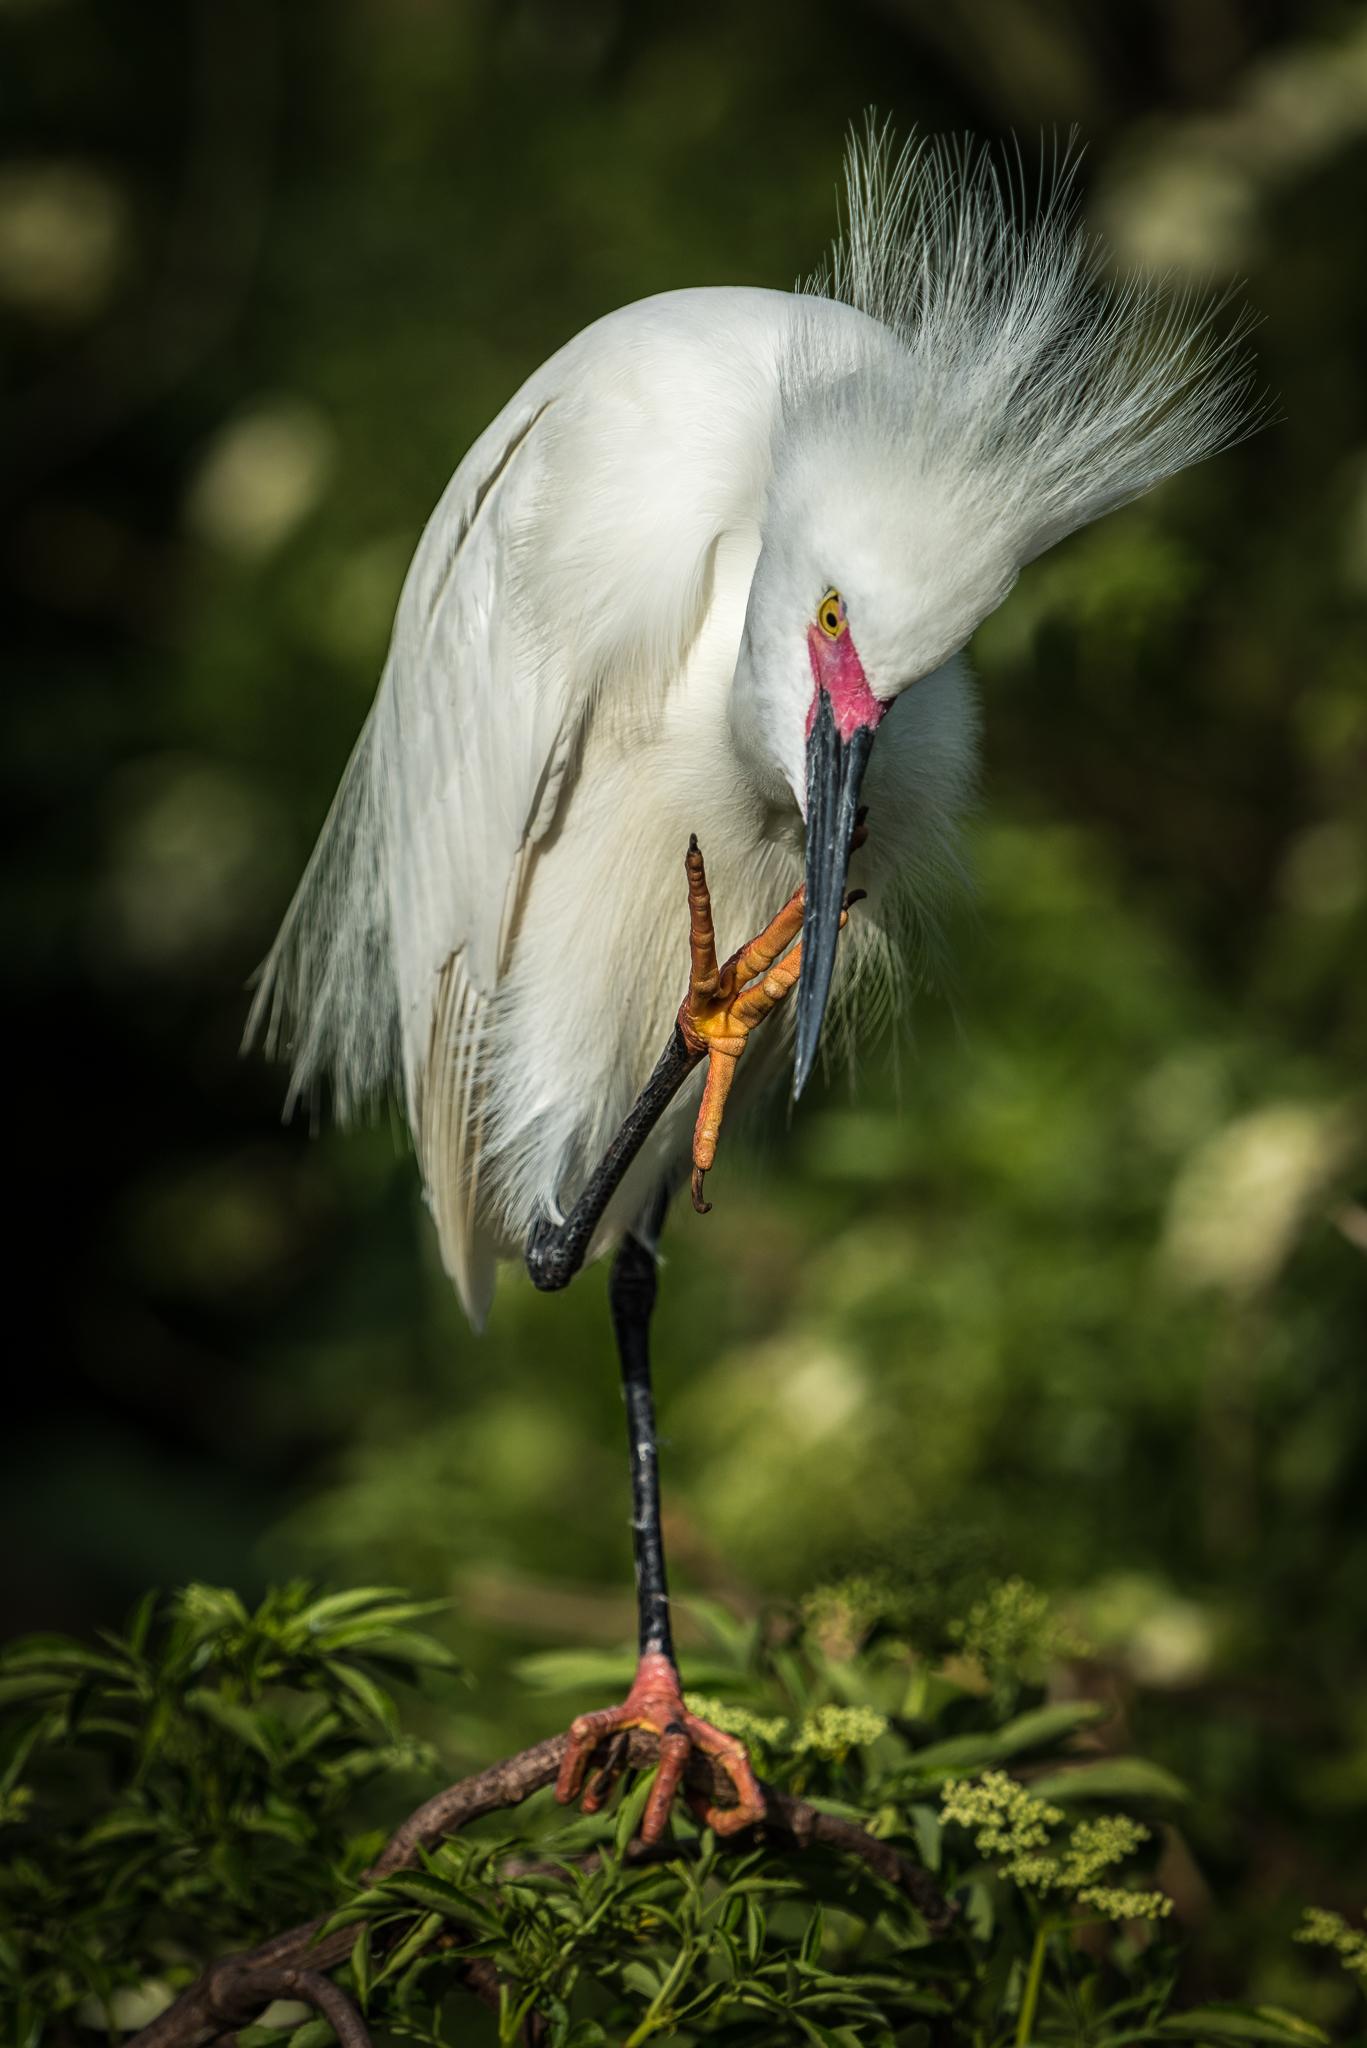 Cleaning Beak